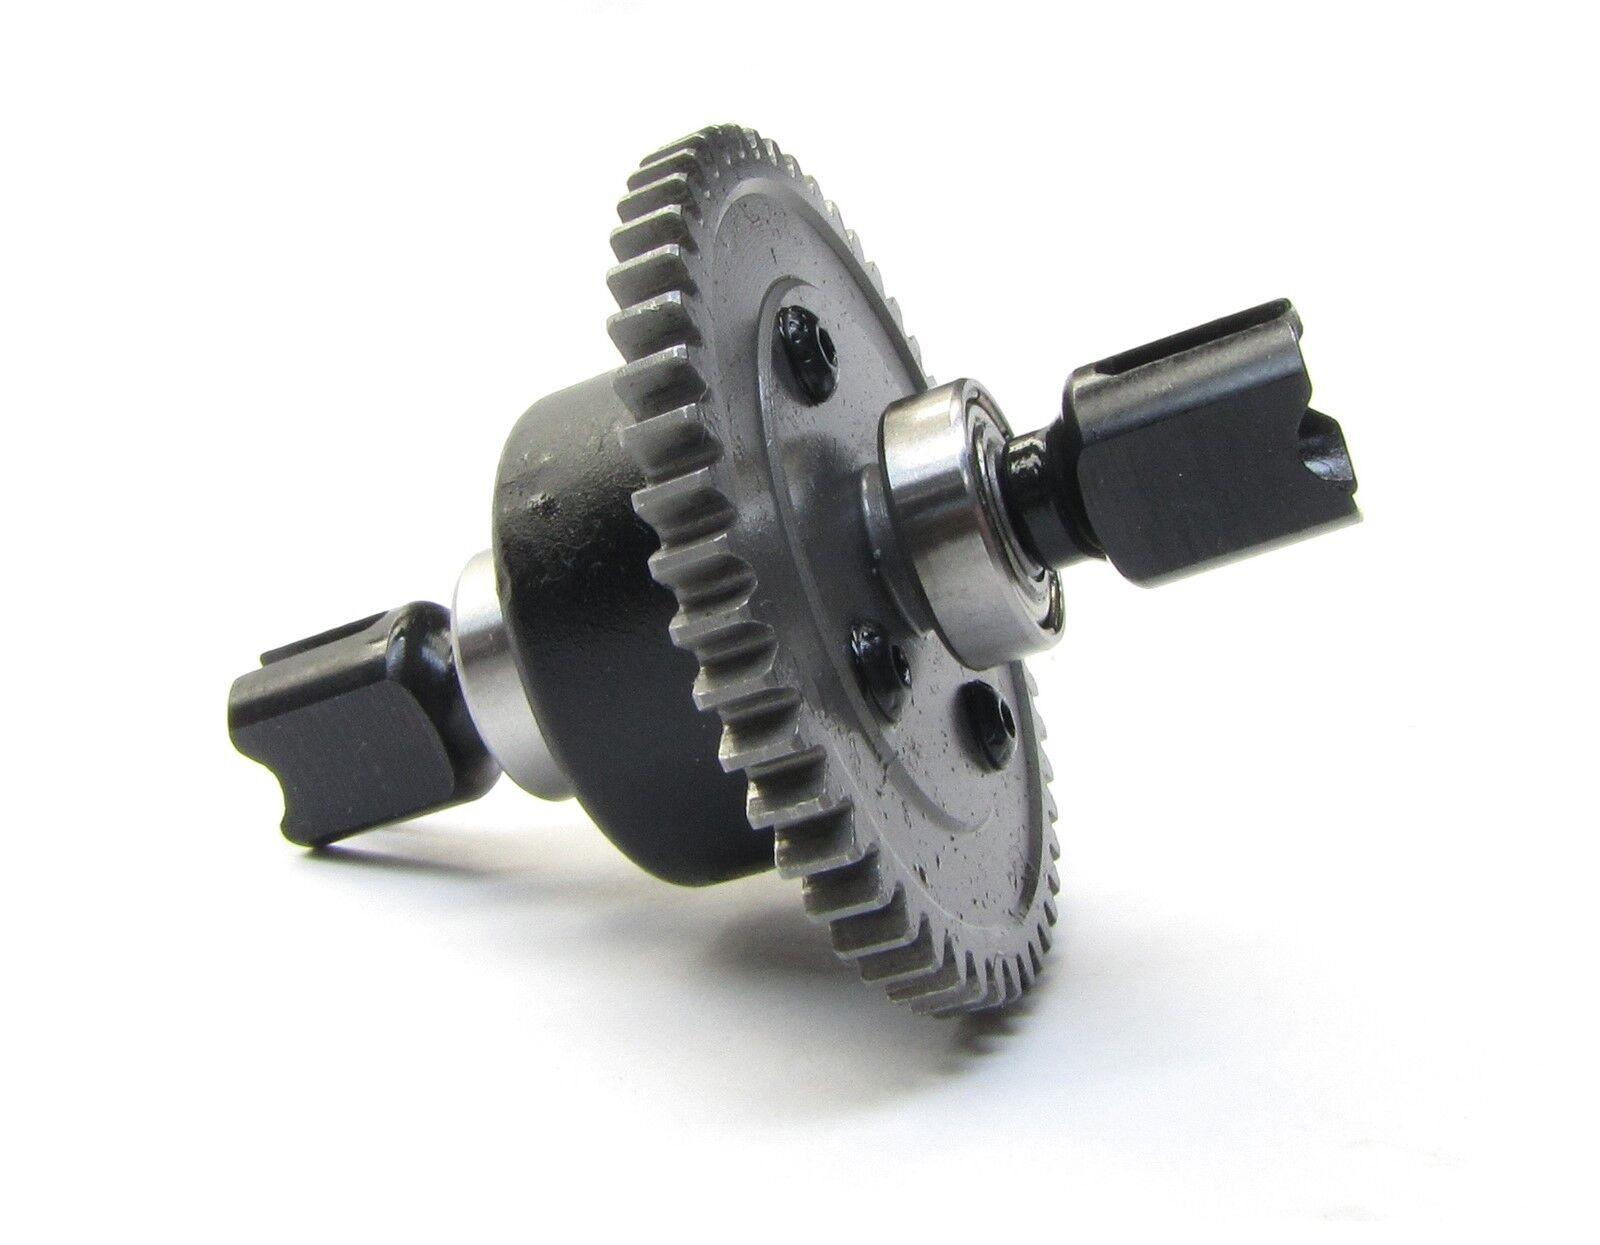 Arrma OUTCAST 6s BLX - CENTER DIFFERENTIAL (diff 50t spur gear typhon AR106021